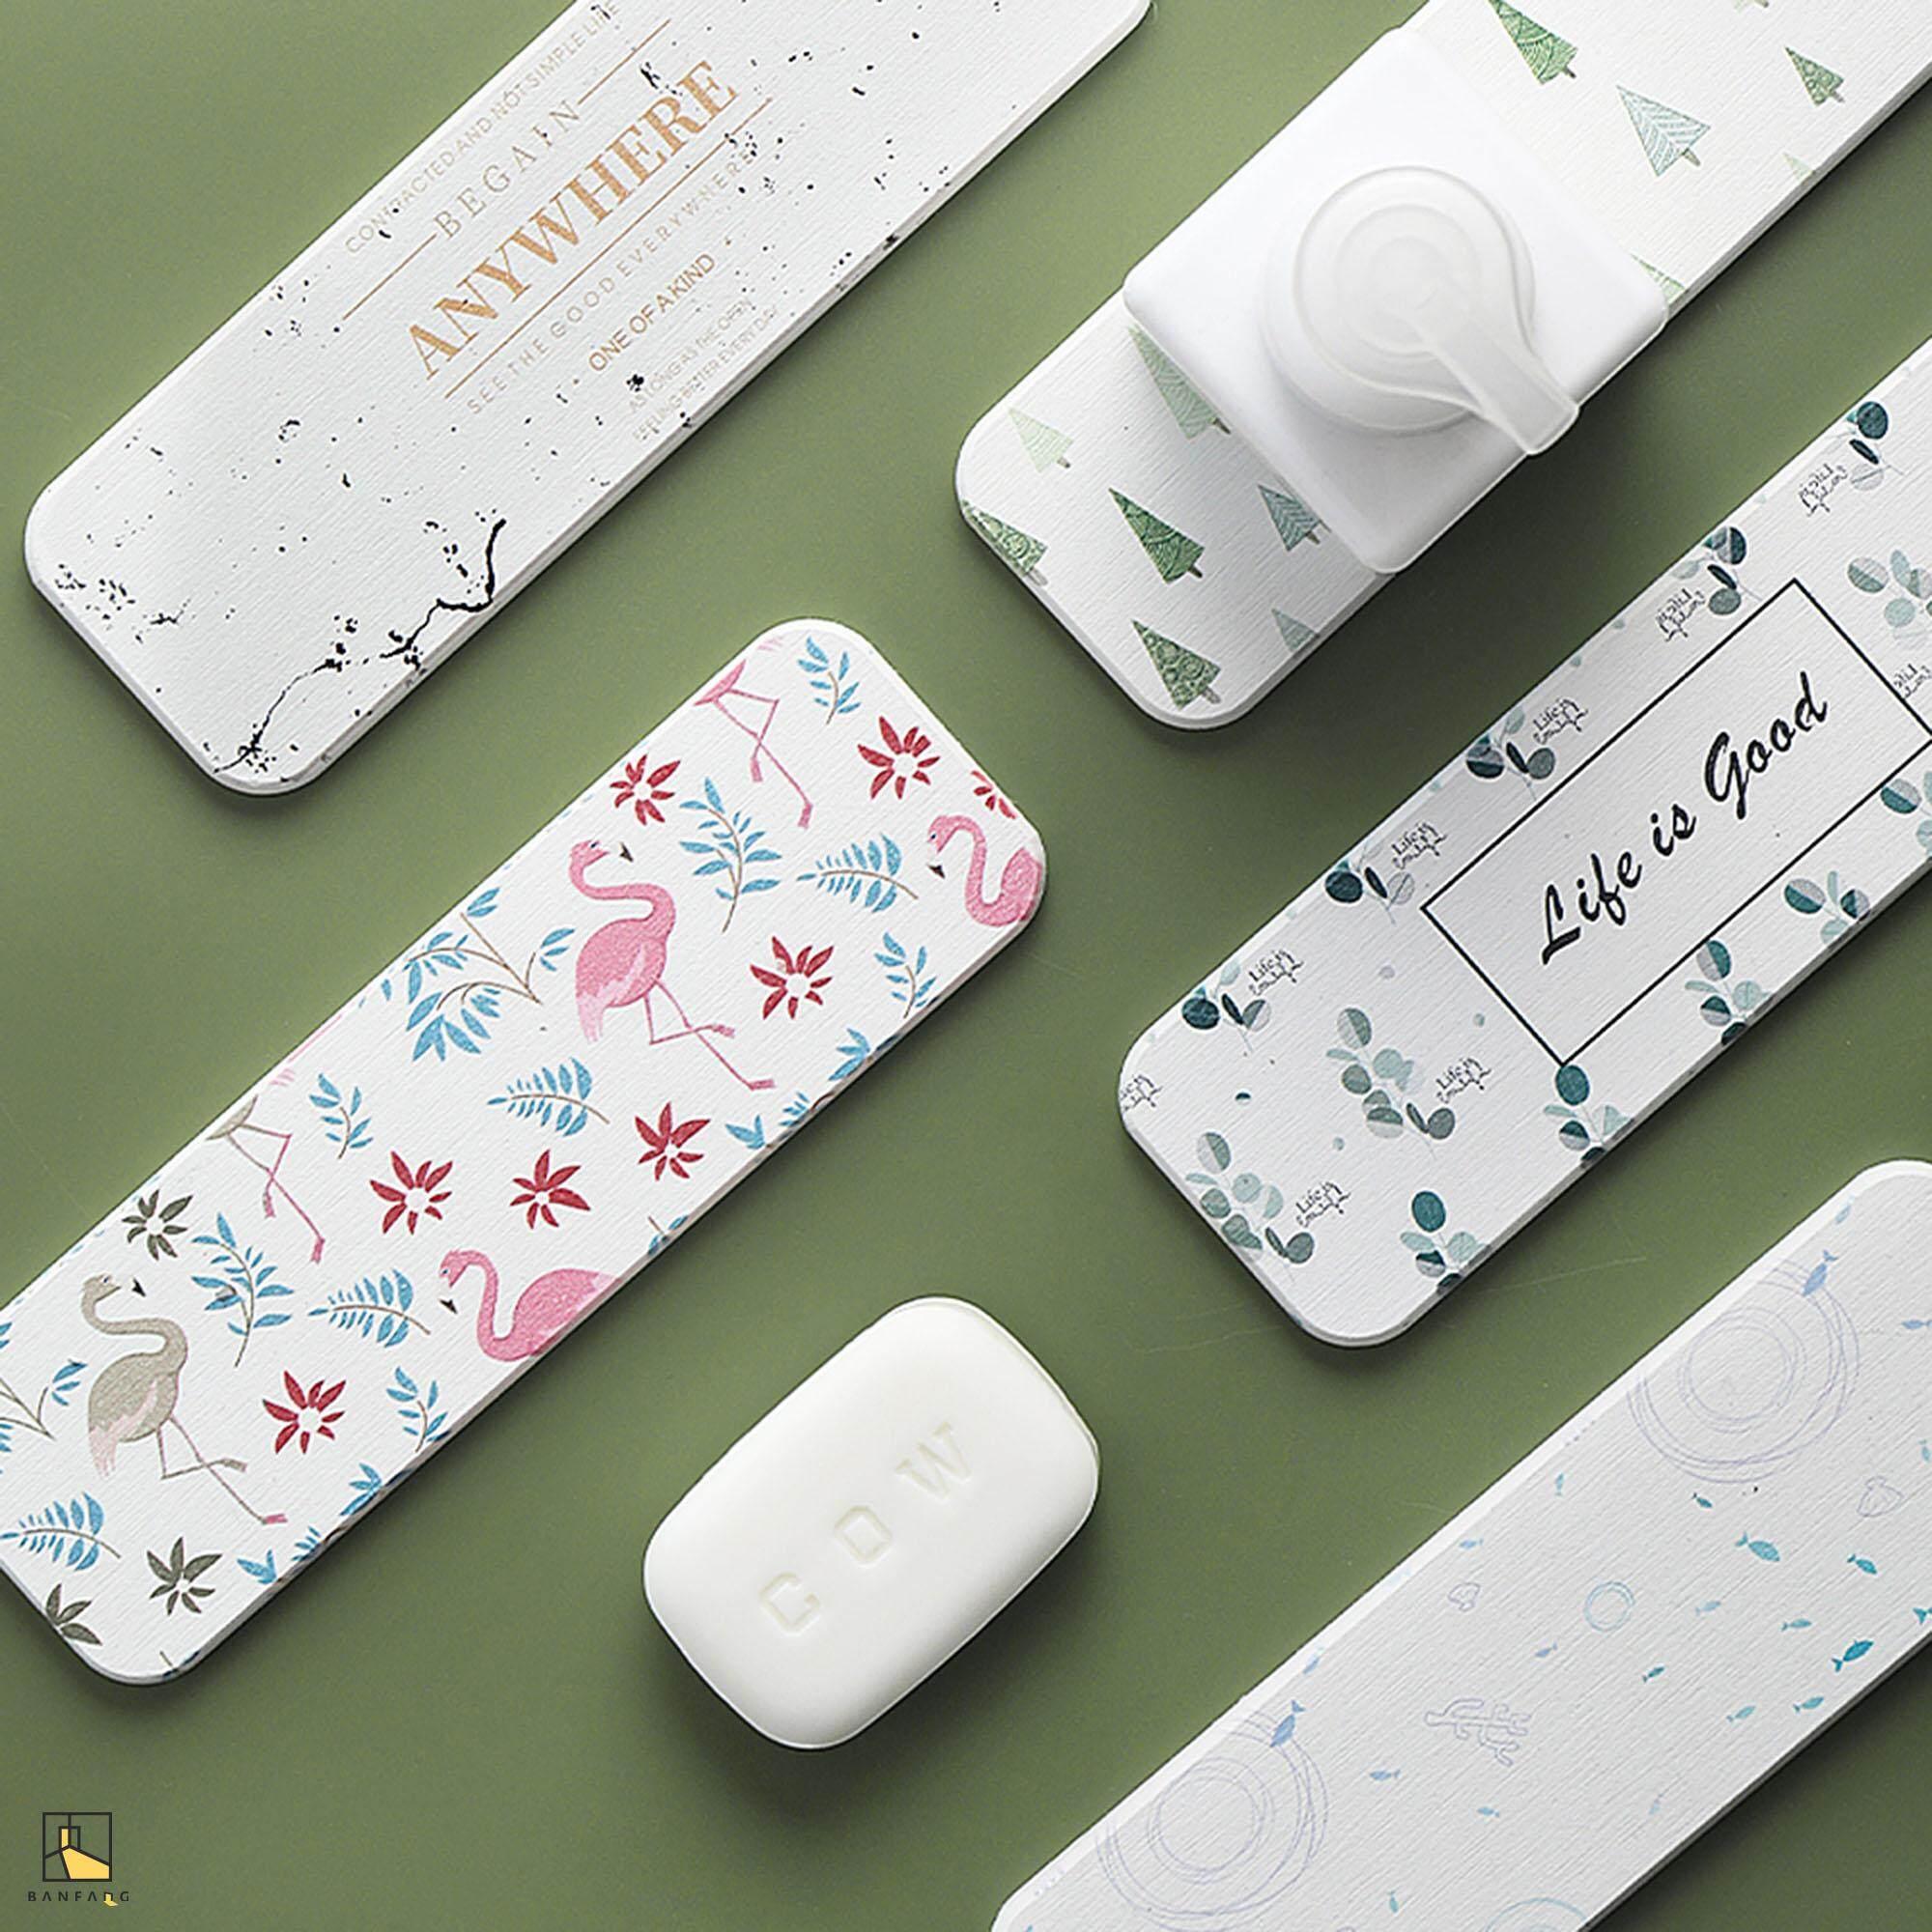 BANFANG Diatomaceous soap pad wash basin soap holder toothbrush cup mat  diatomaceous mud pad